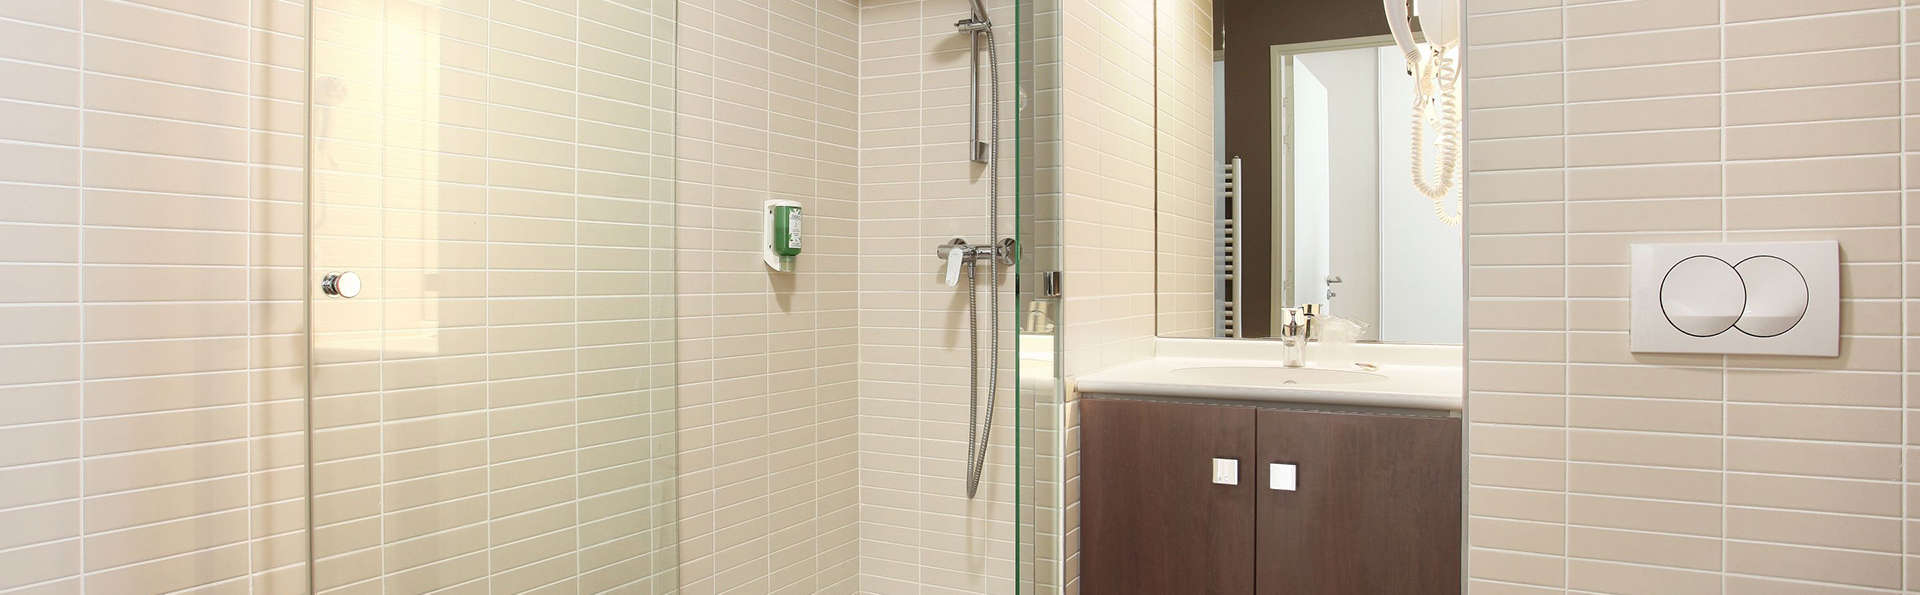 Appart'Hôtel Odalys Confluence  - Edit_Bathroom2.jpg